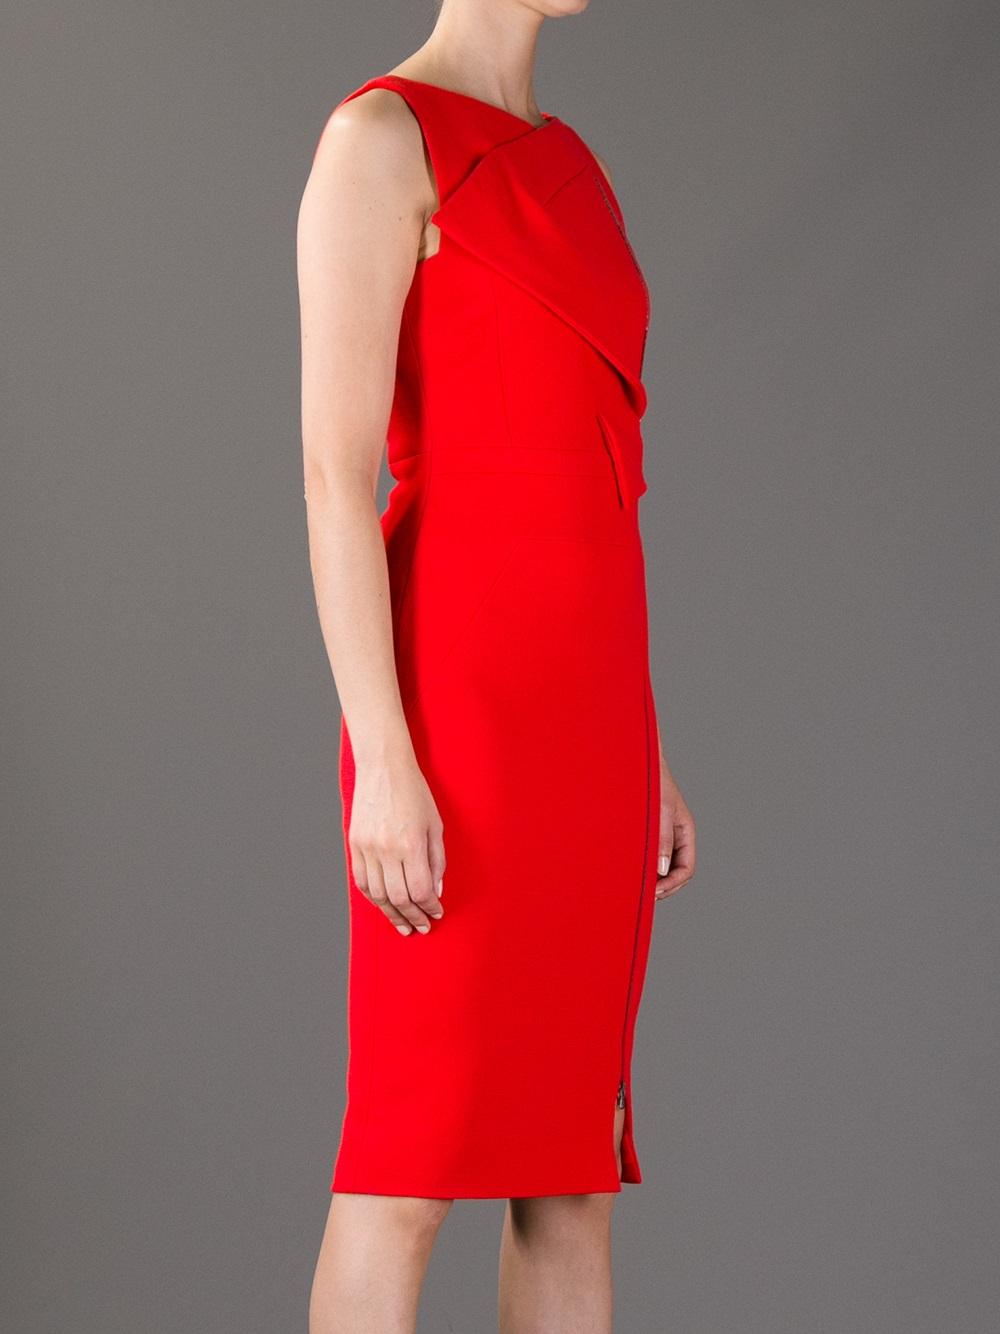 Red Knee Length Dress Antonio Berardi